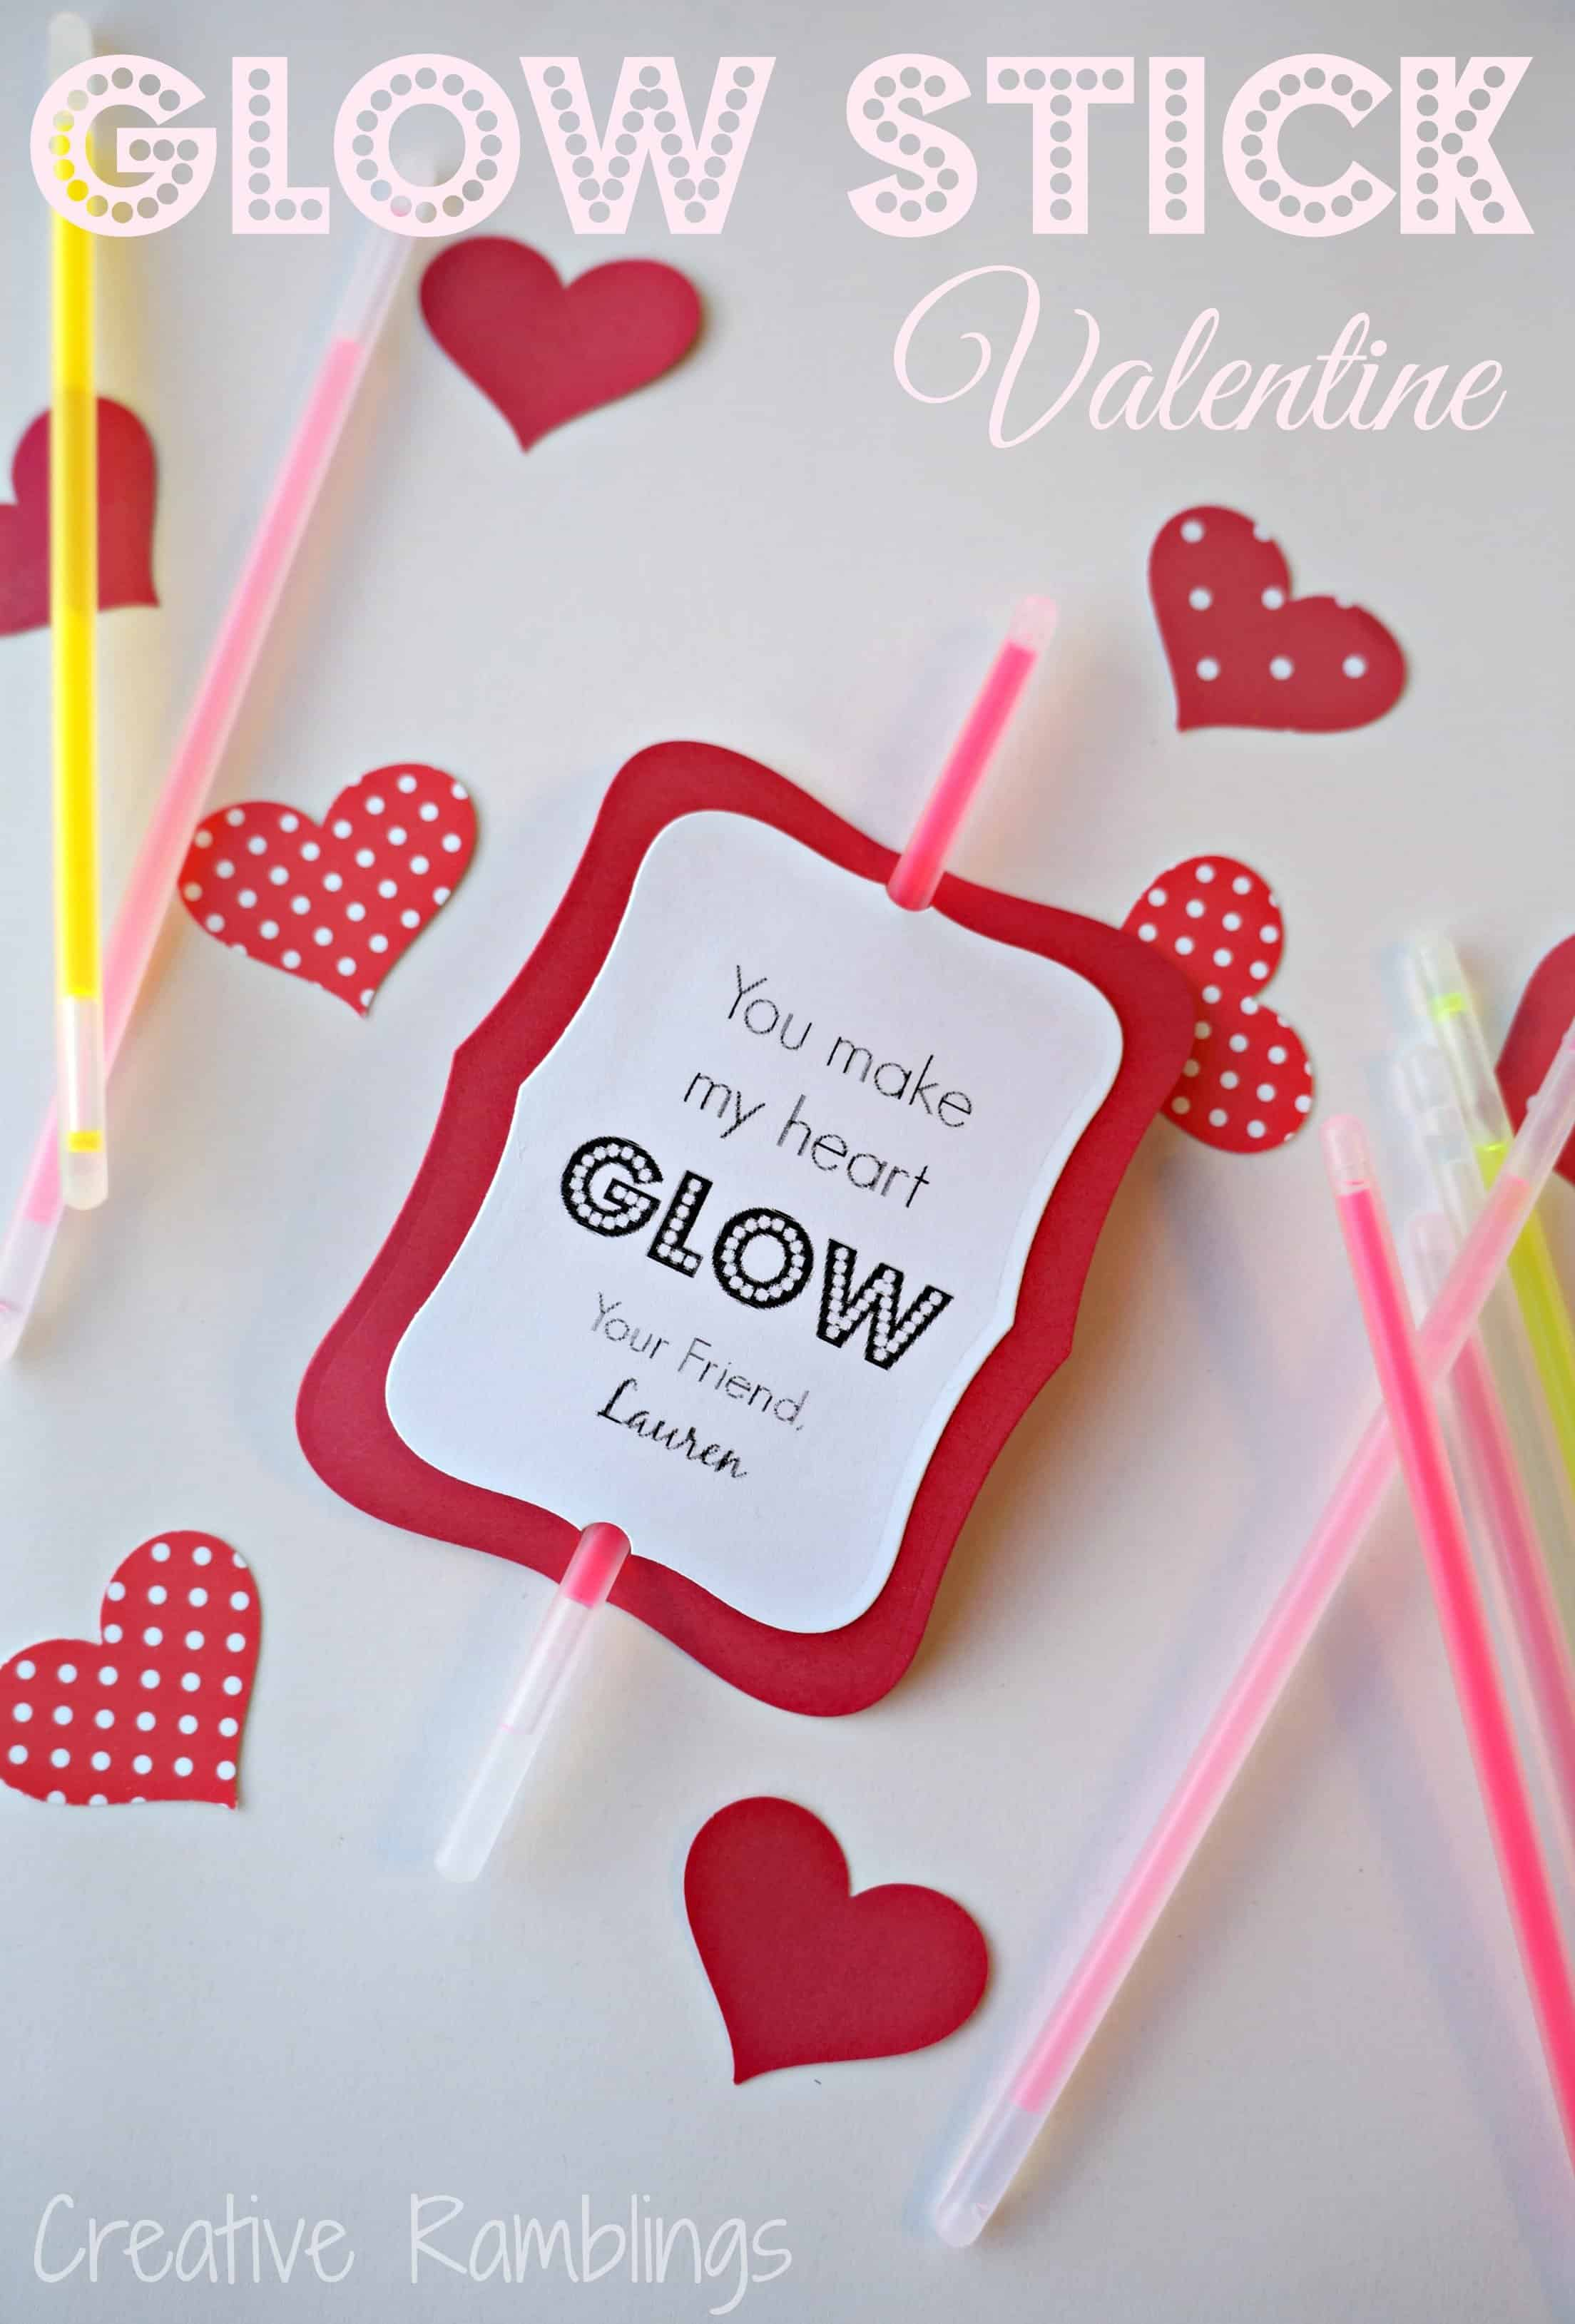 You Make My Heart Glow Valentine Creative Ramblings